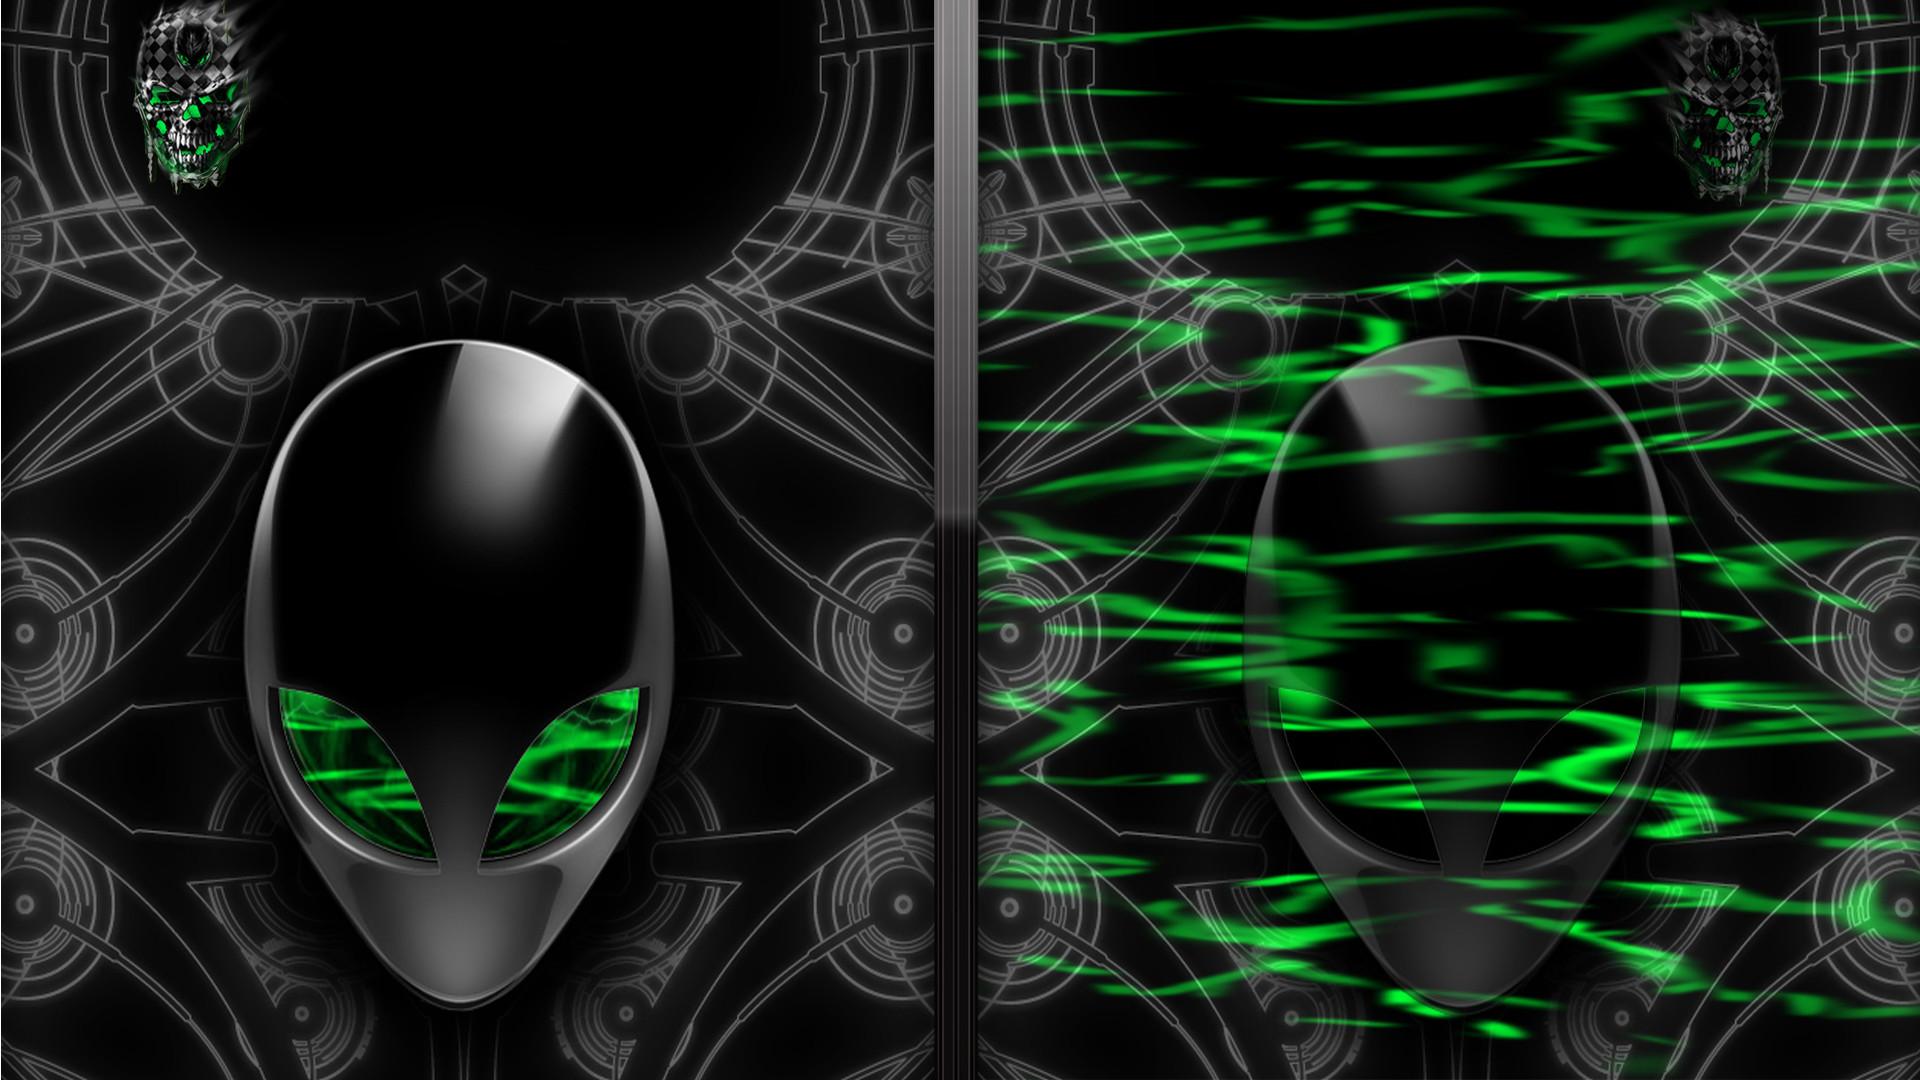 1920x1200 Rainbow Alienware Green by darkangelkrys on DeviantArt